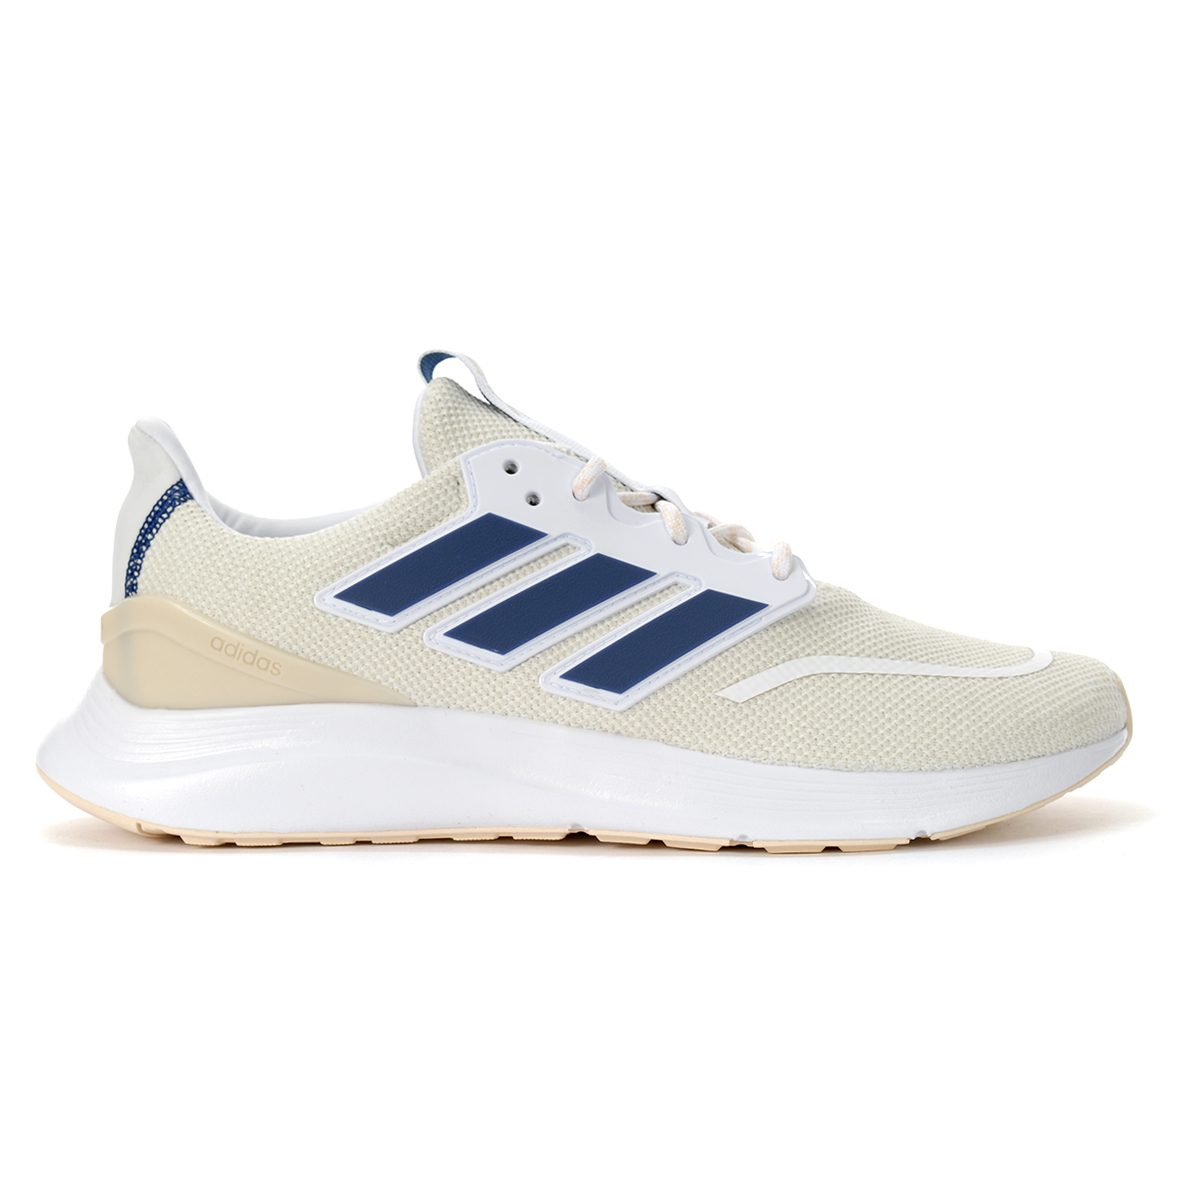 Adidas Men's EnergyFalcon Cloud White